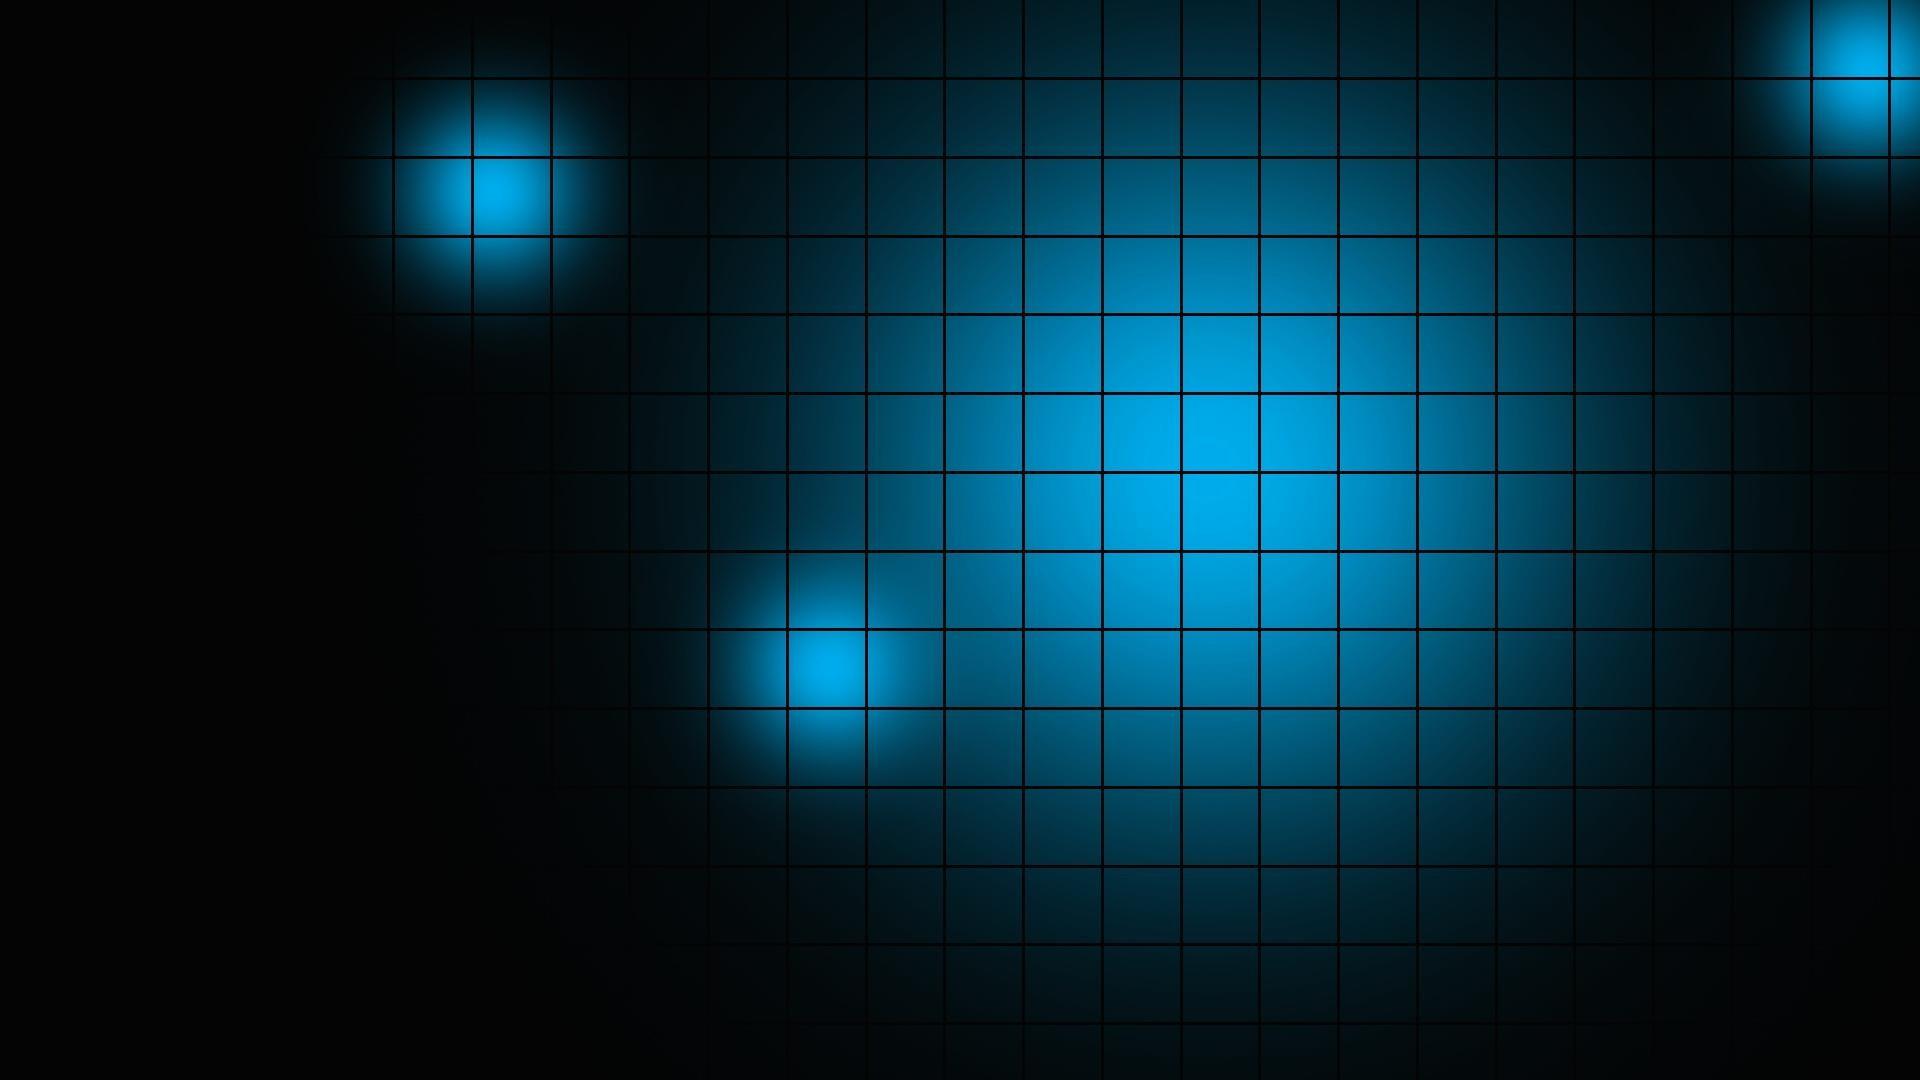 Black-and-Blue-HD-Photos